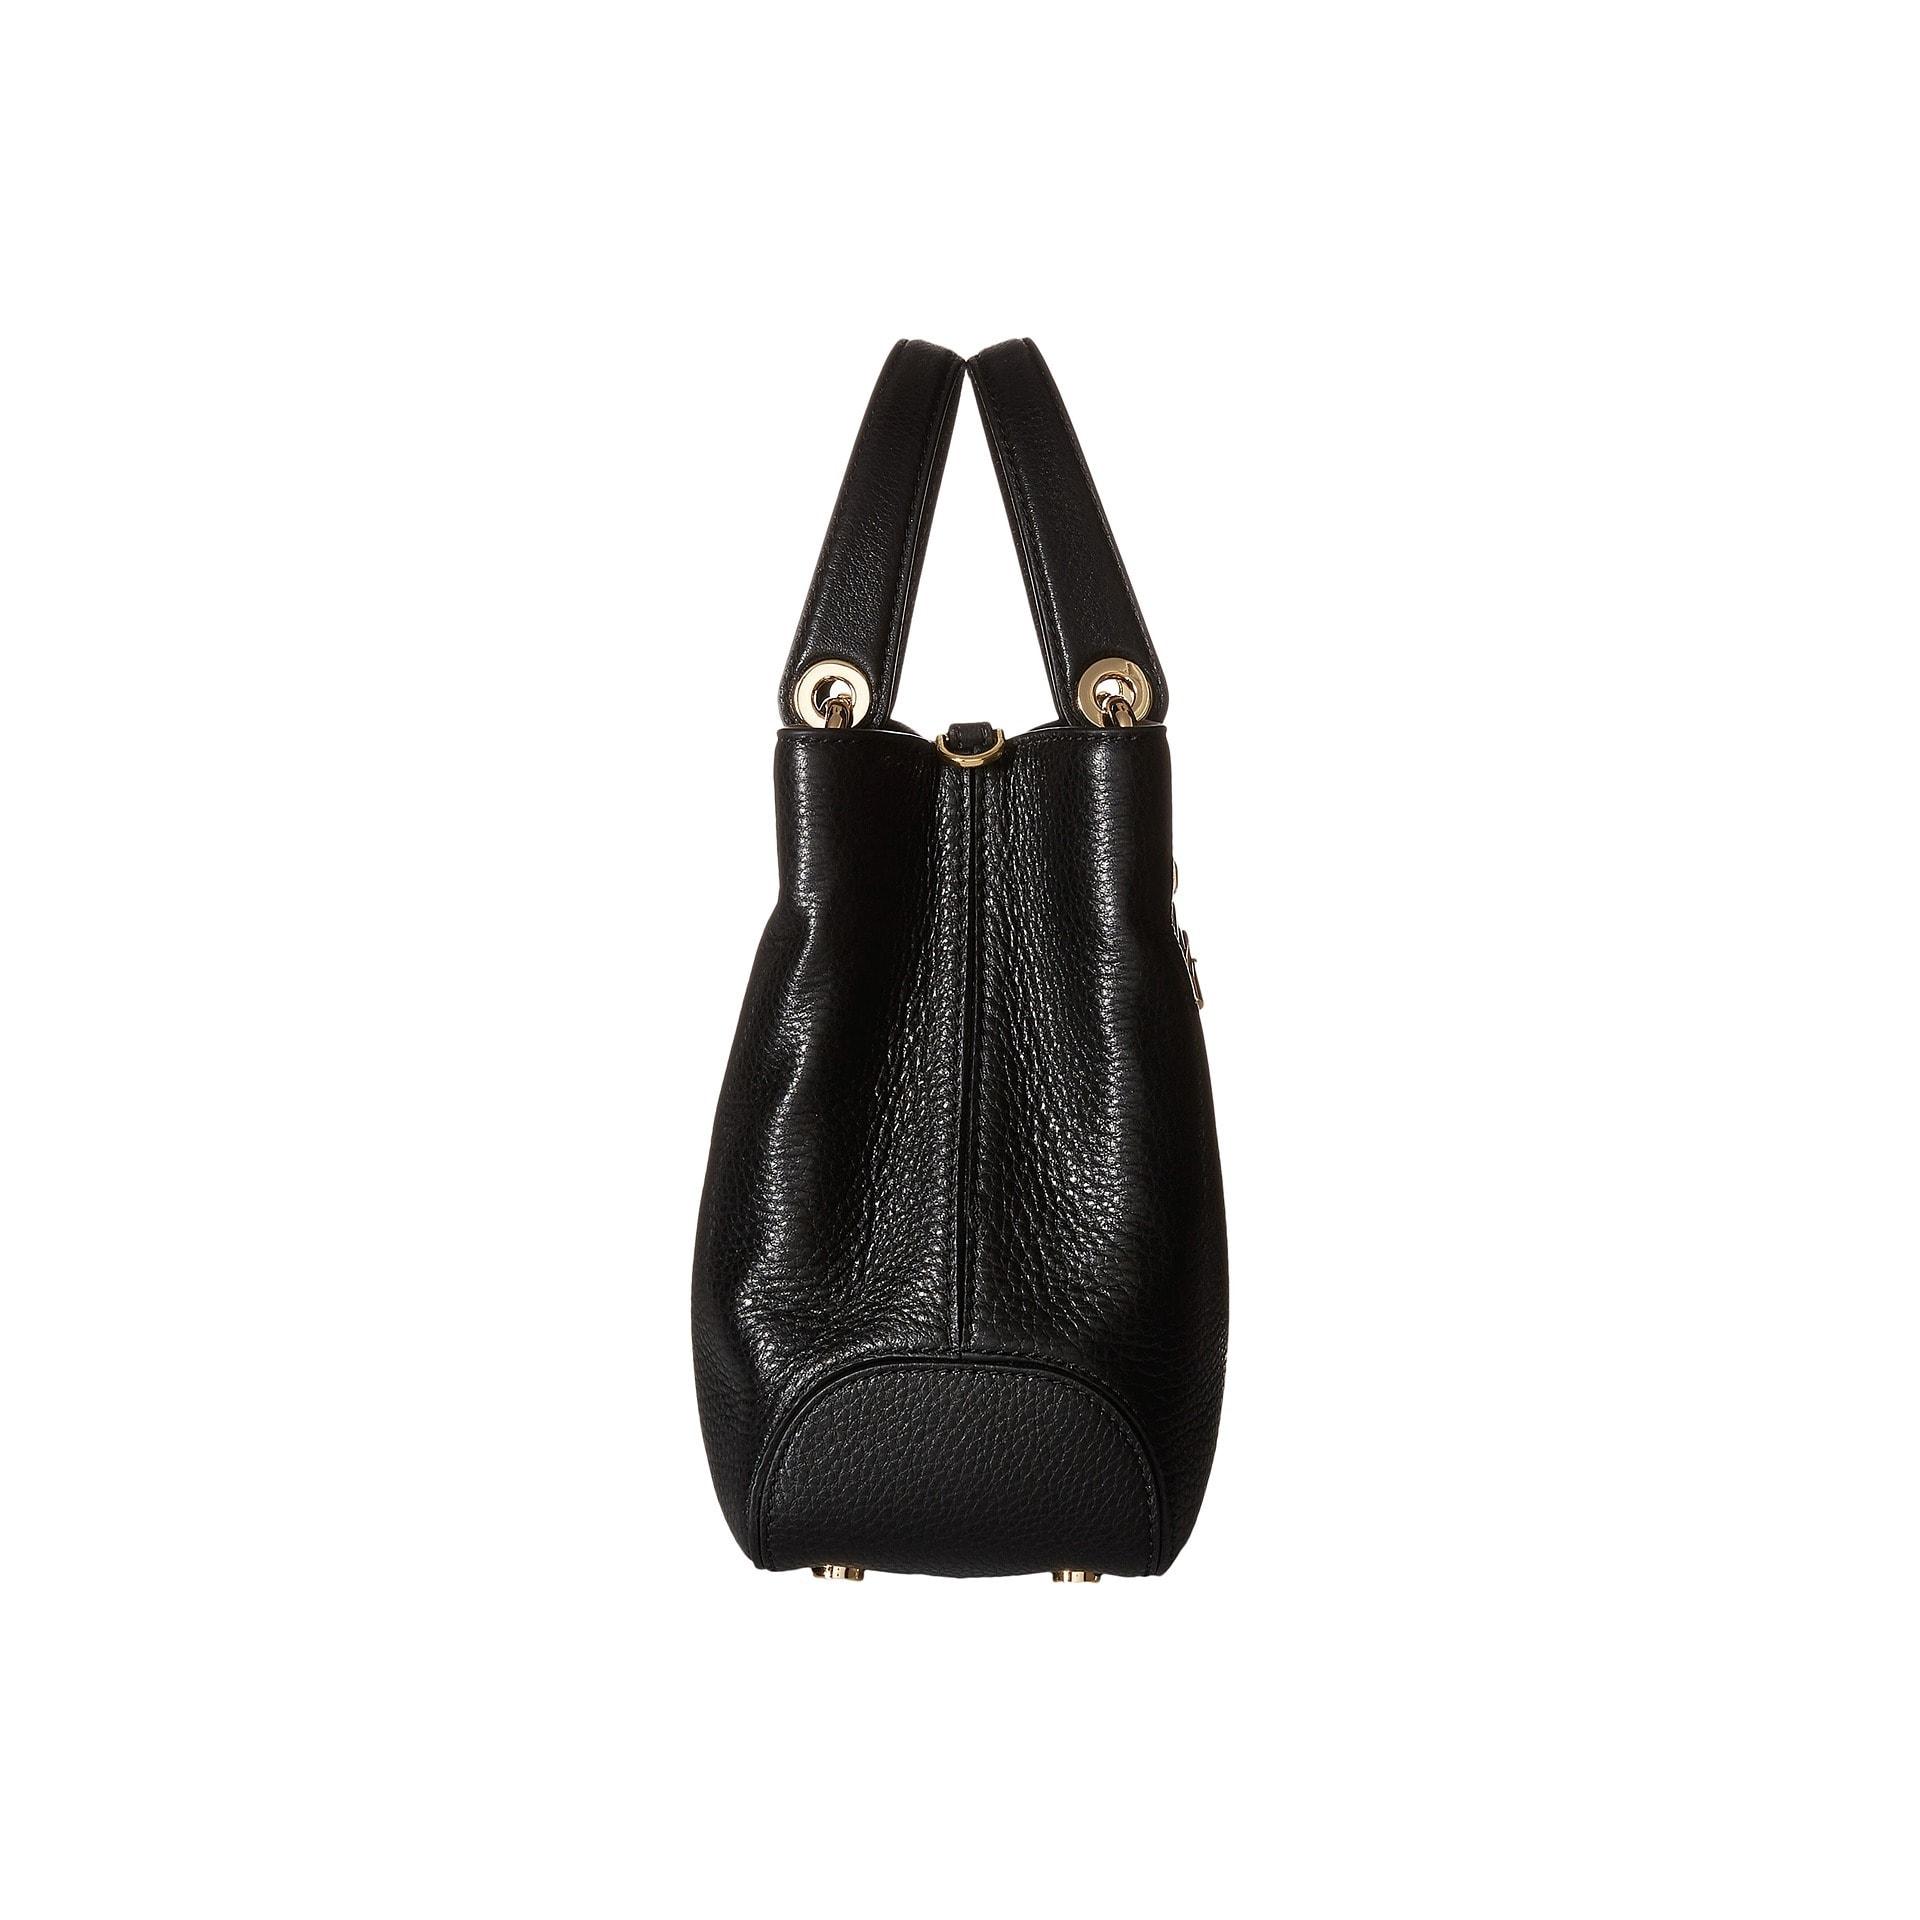 efa3e7238c55 Shop Michael Kors Annabelle Black Medium Top Zip Tote Handbag - Free  Shipping Today - Overstock - 11403779